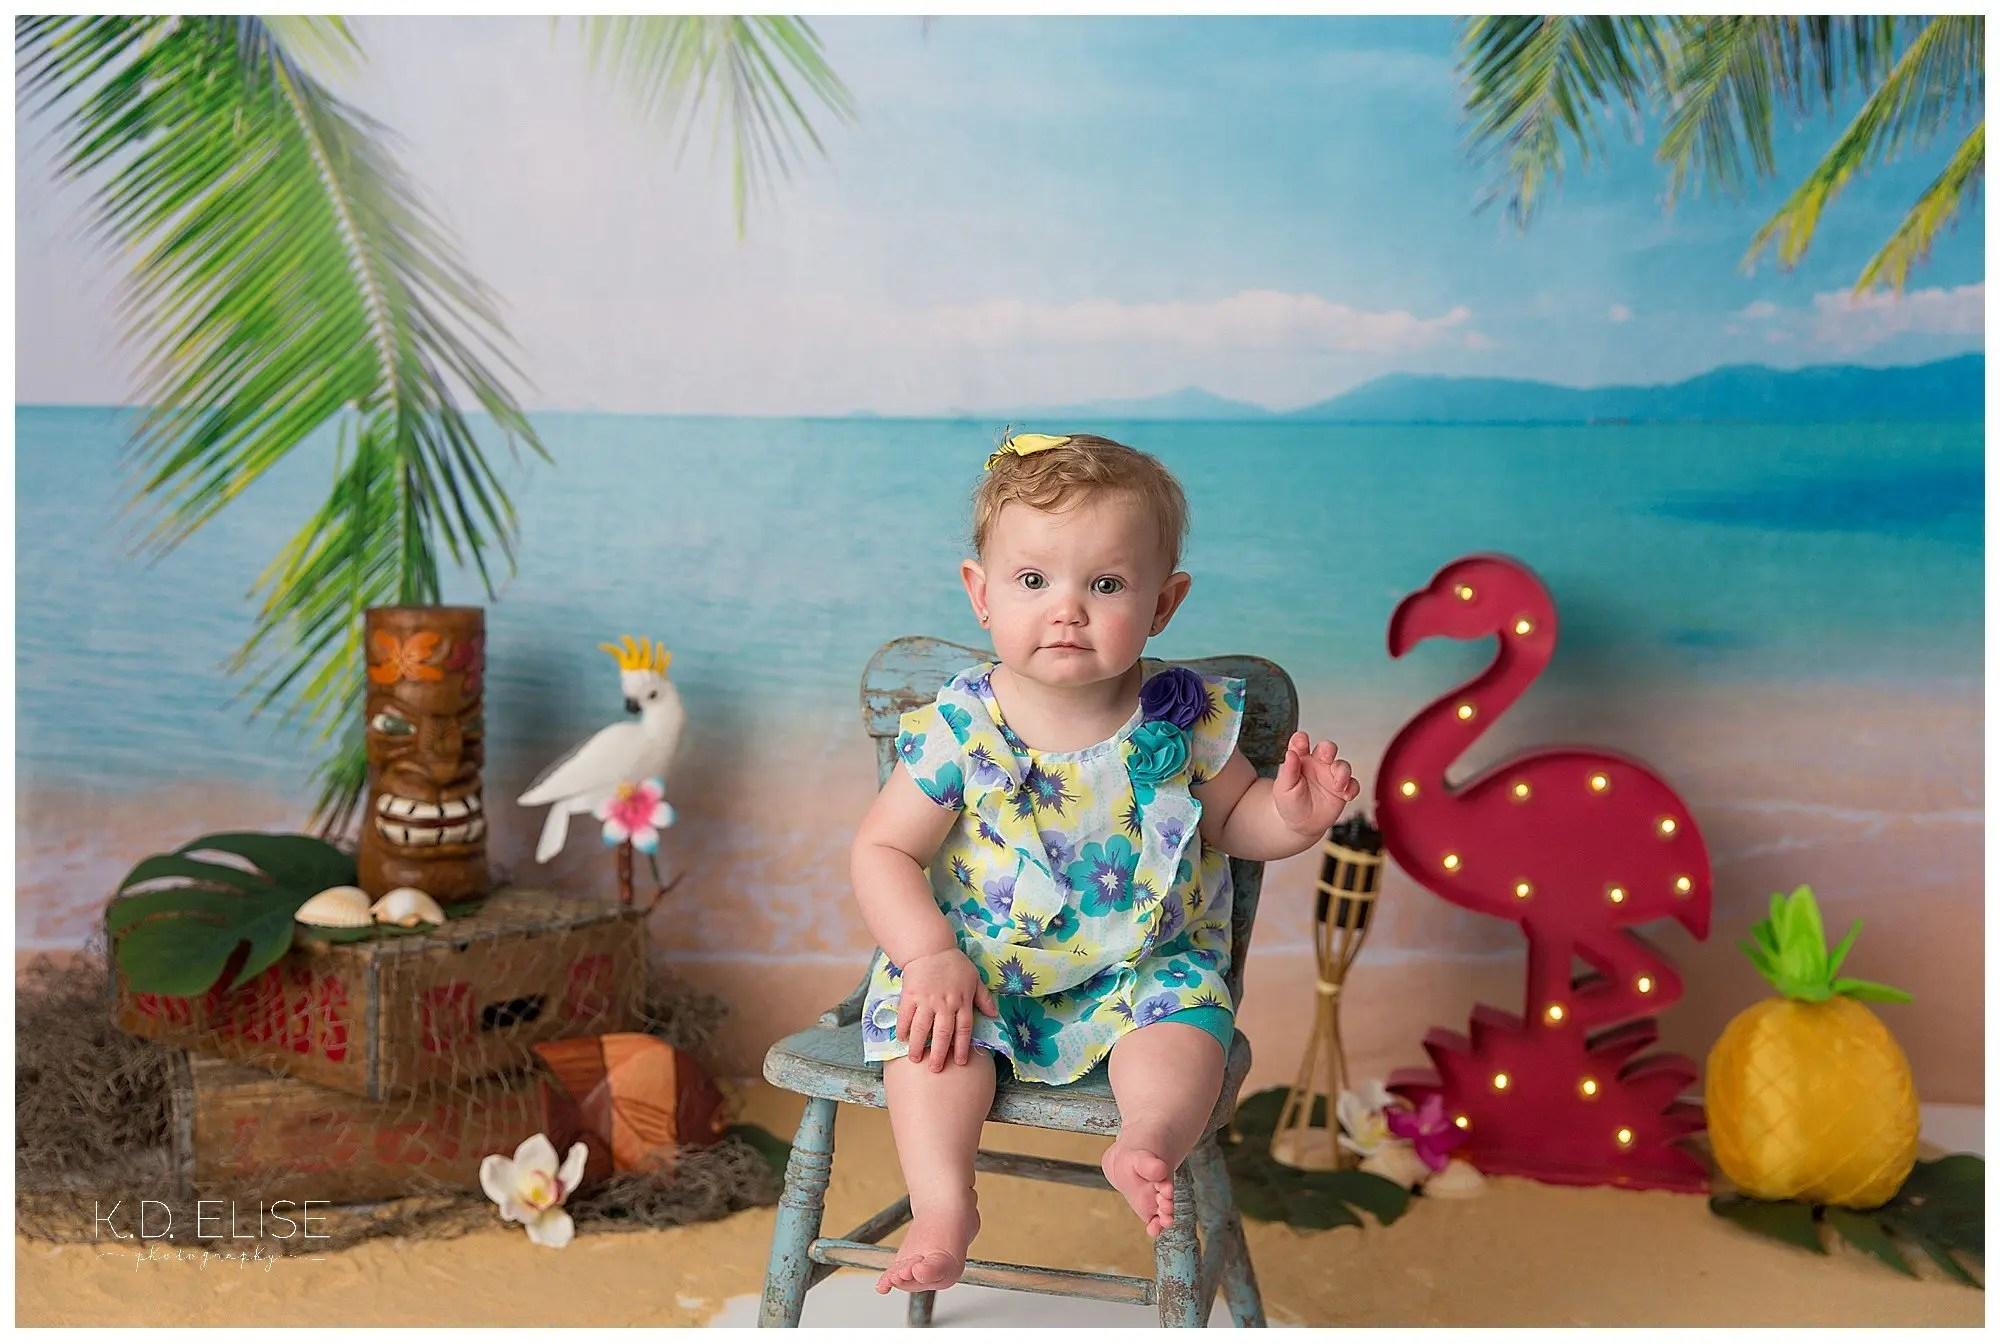 First birthday portrait of baby girl on luau themed cake smash backdrop.